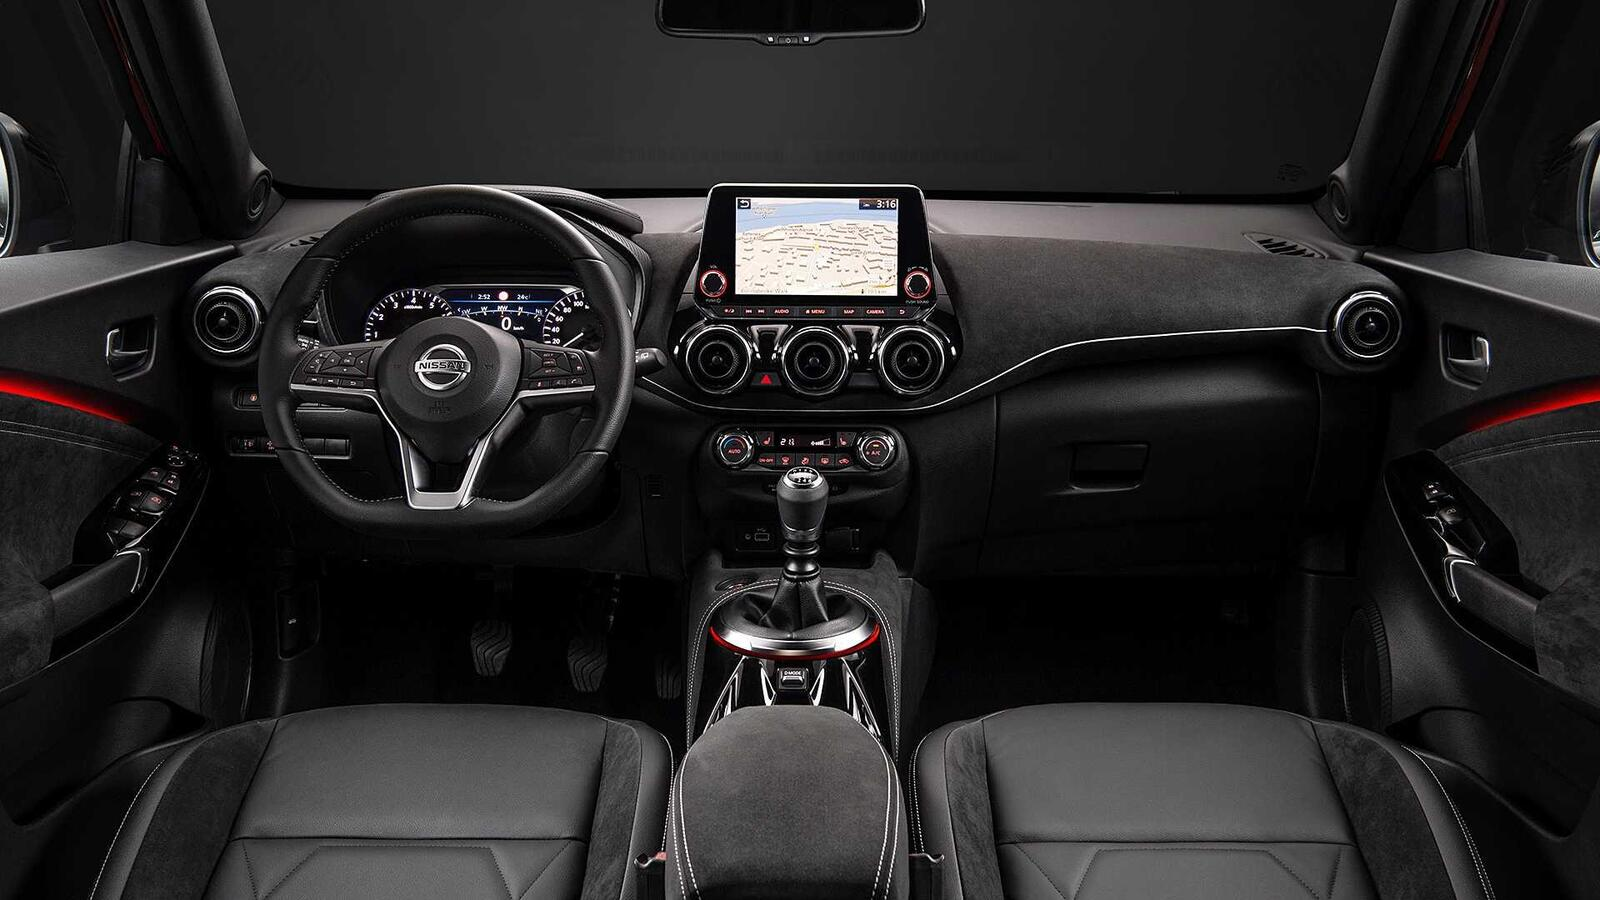 Nội thất Nissan Juke 2020